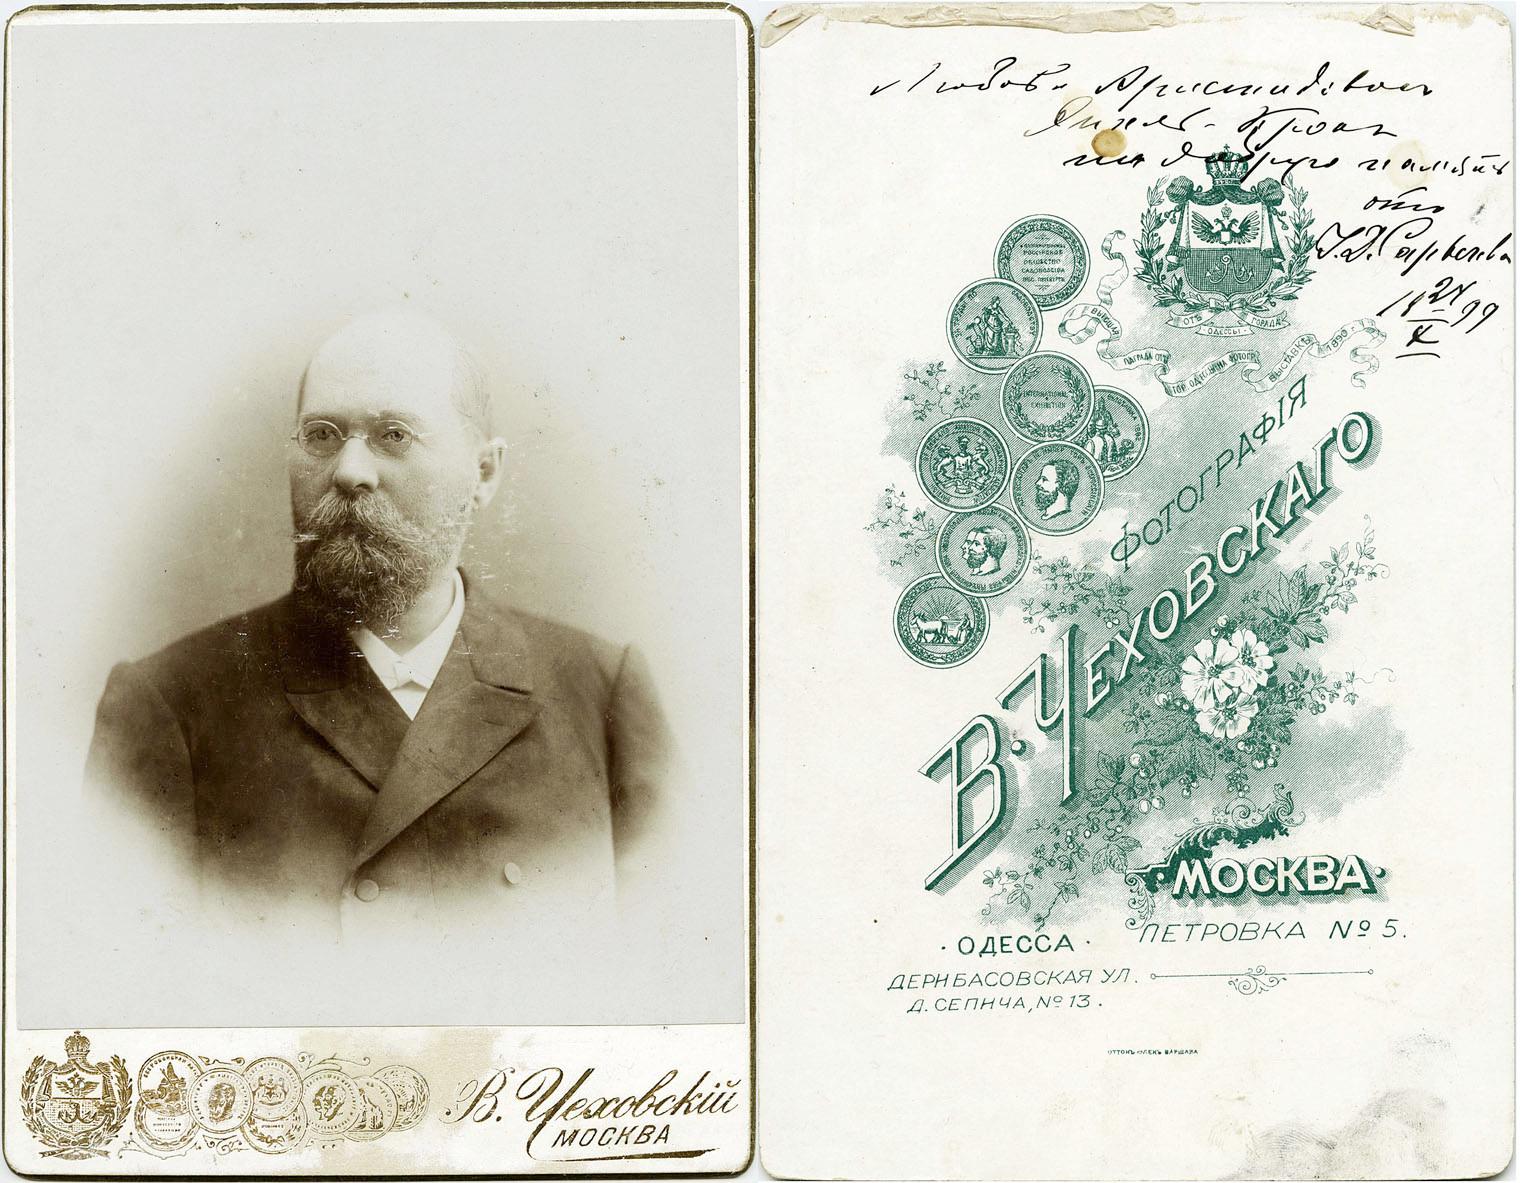 SARYCHEV, I. D.